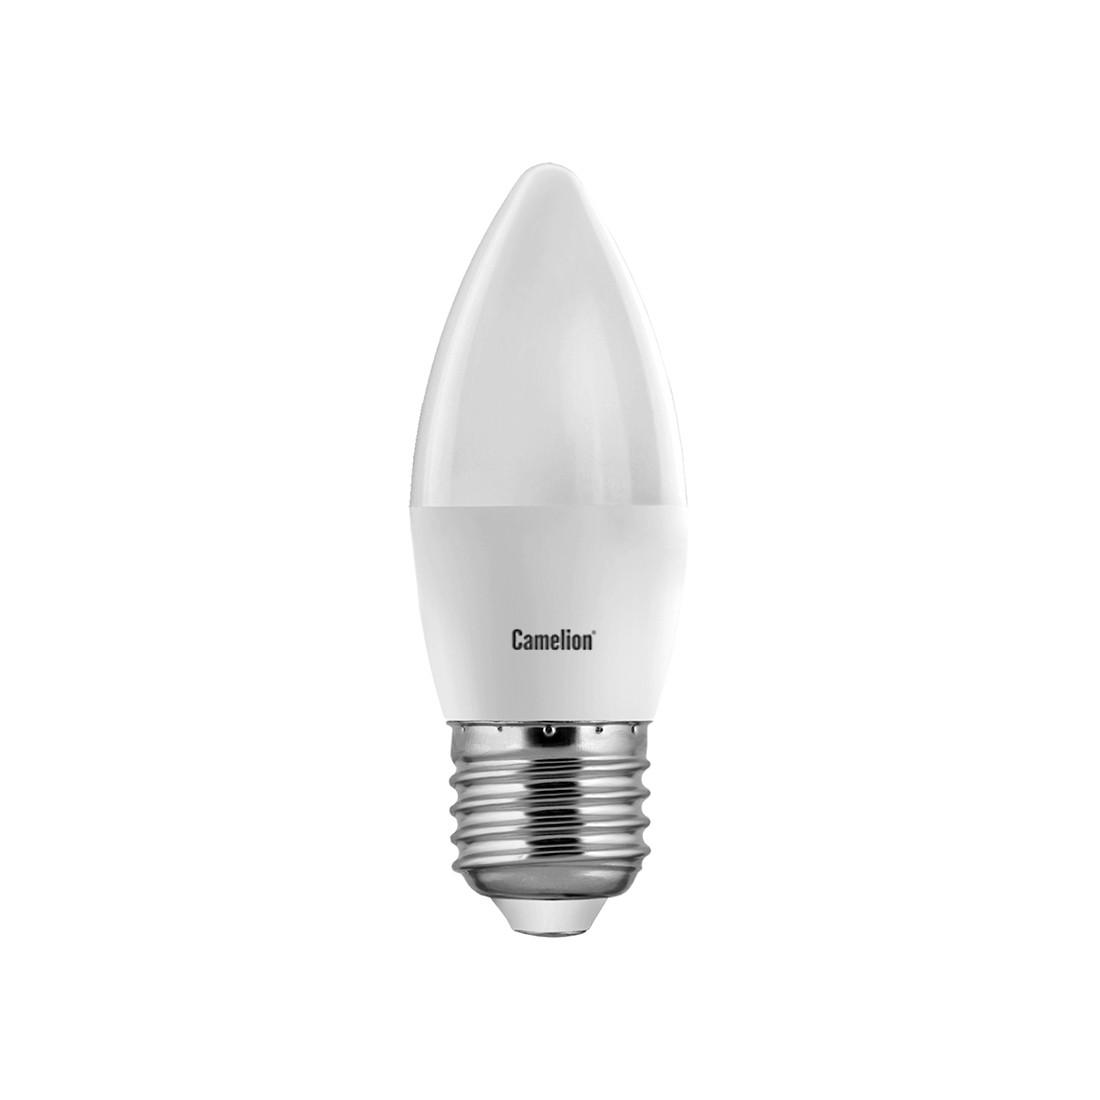 Эл. лампа светодиодная  Camelion  LED7-C35/830/E27